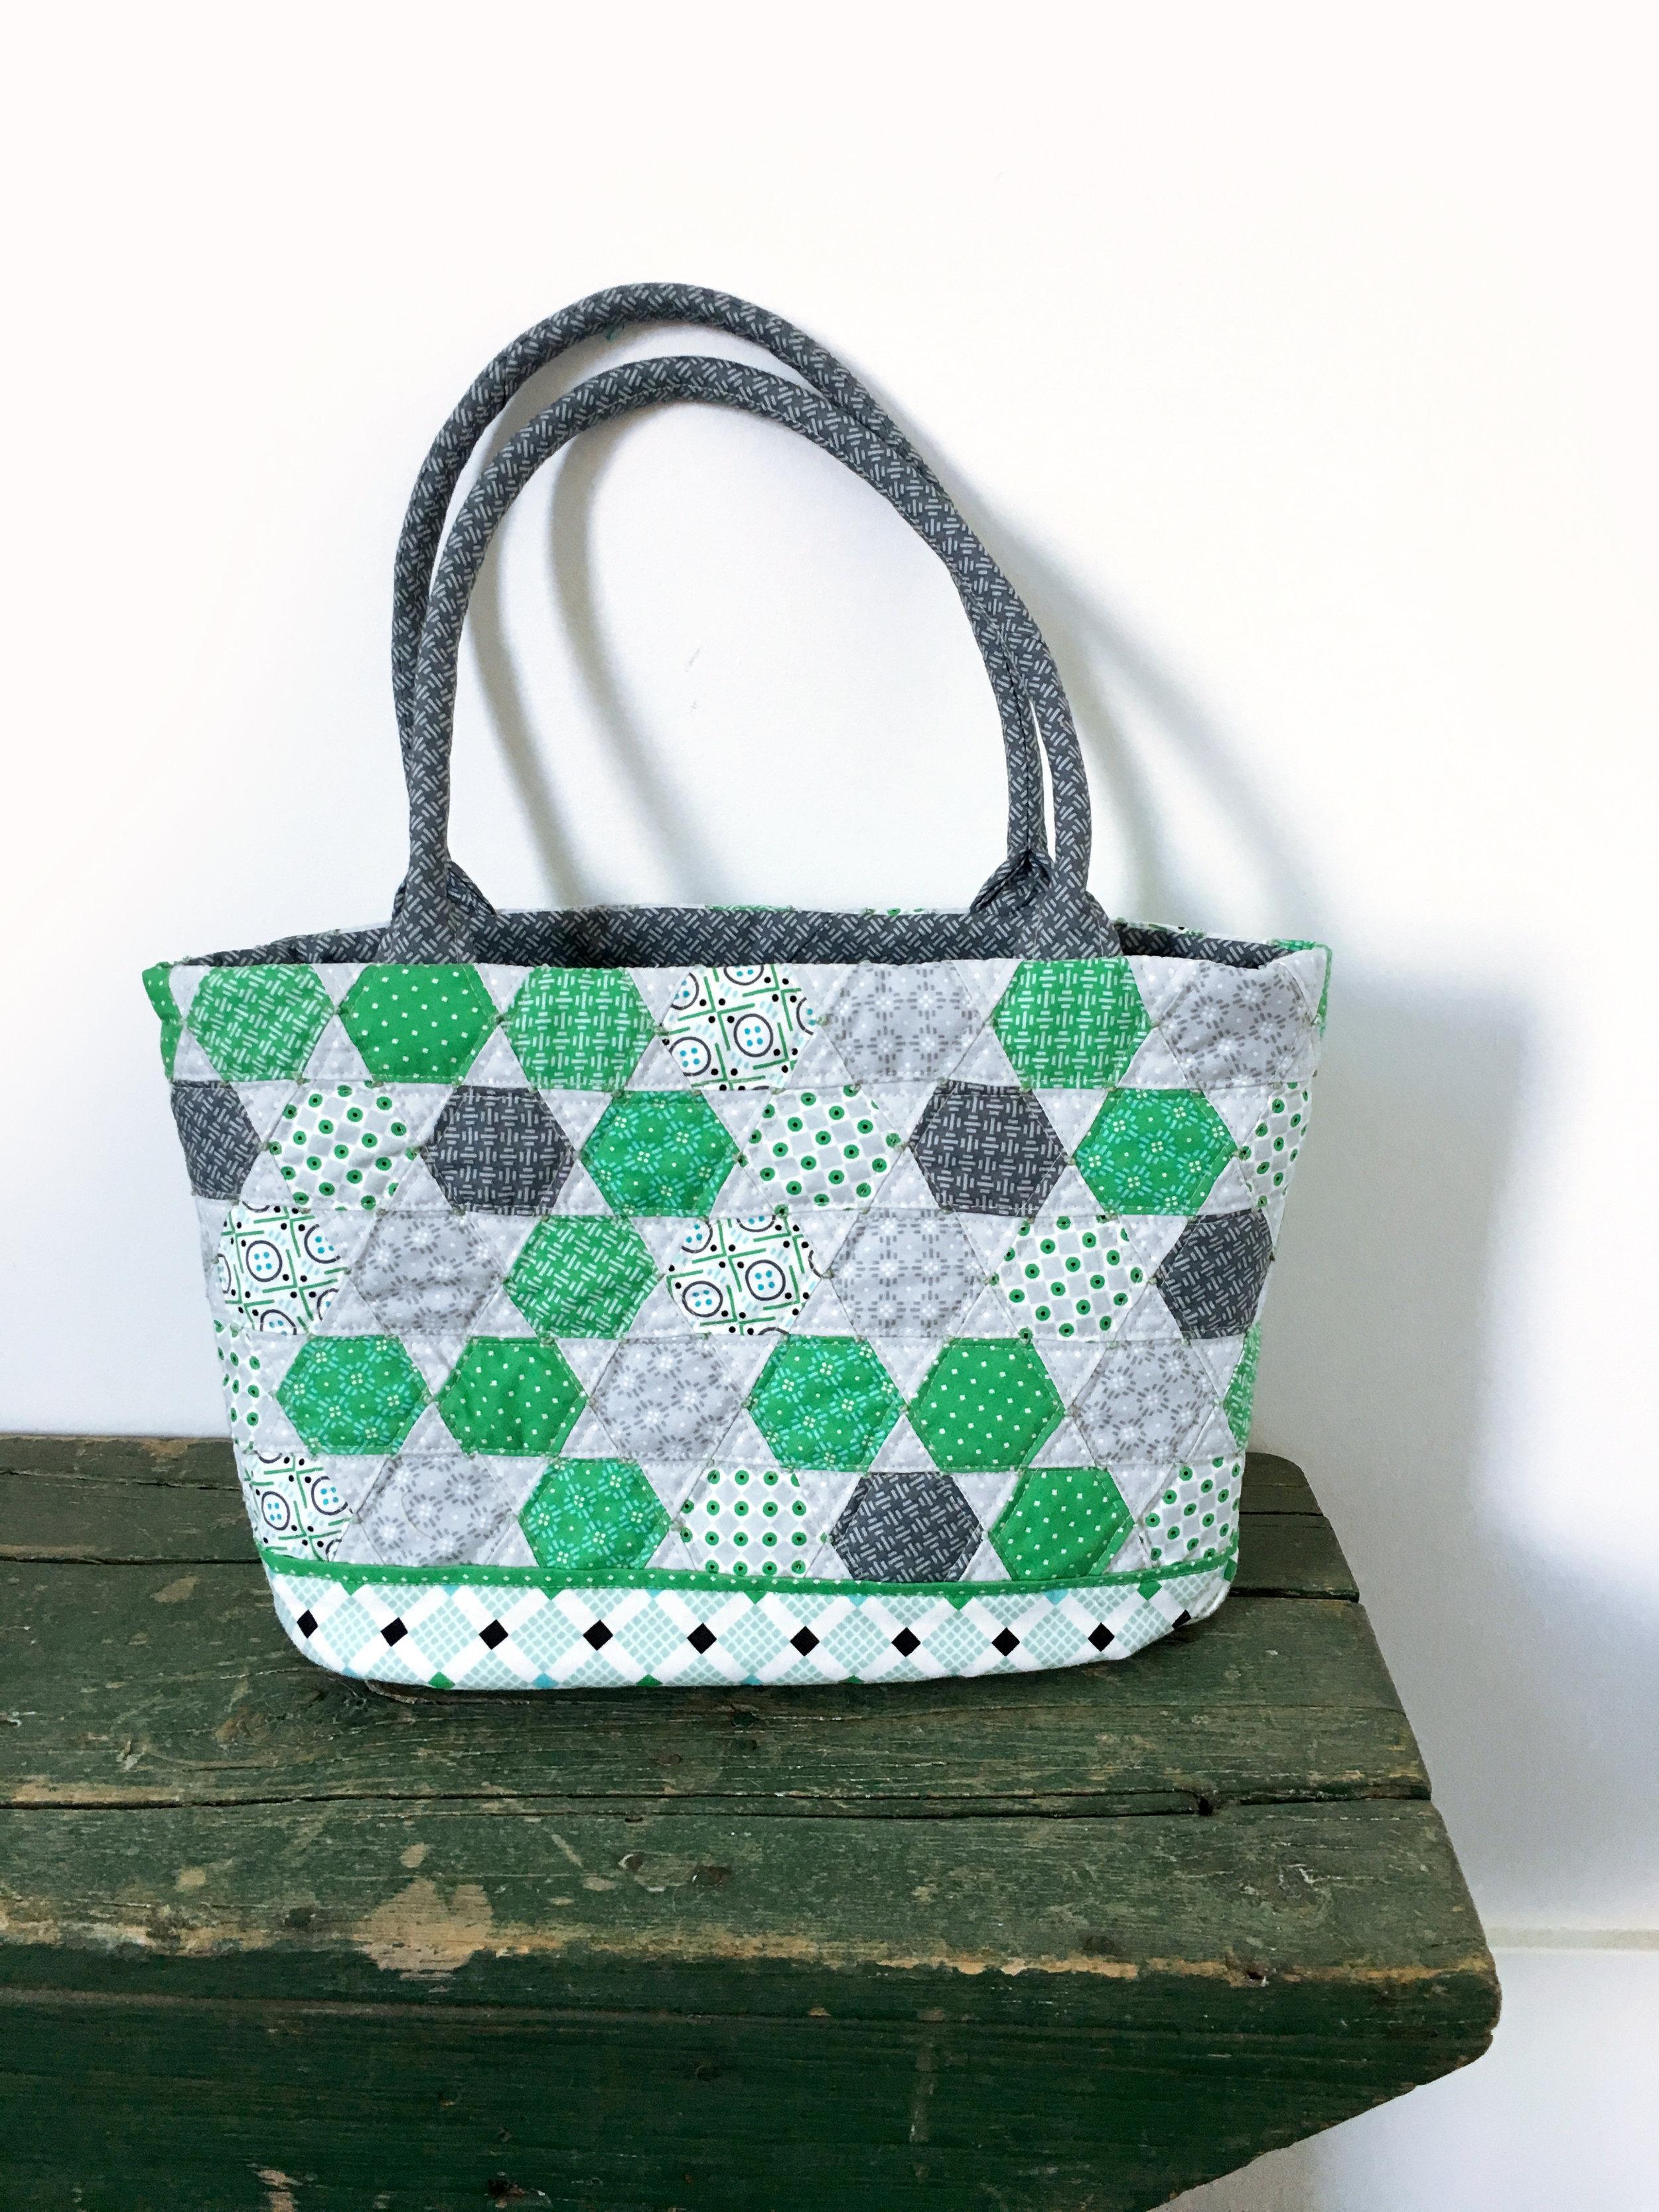 bag-UPPERCASE-Vol-2-Dots-Dashes-Diamonds.jpg